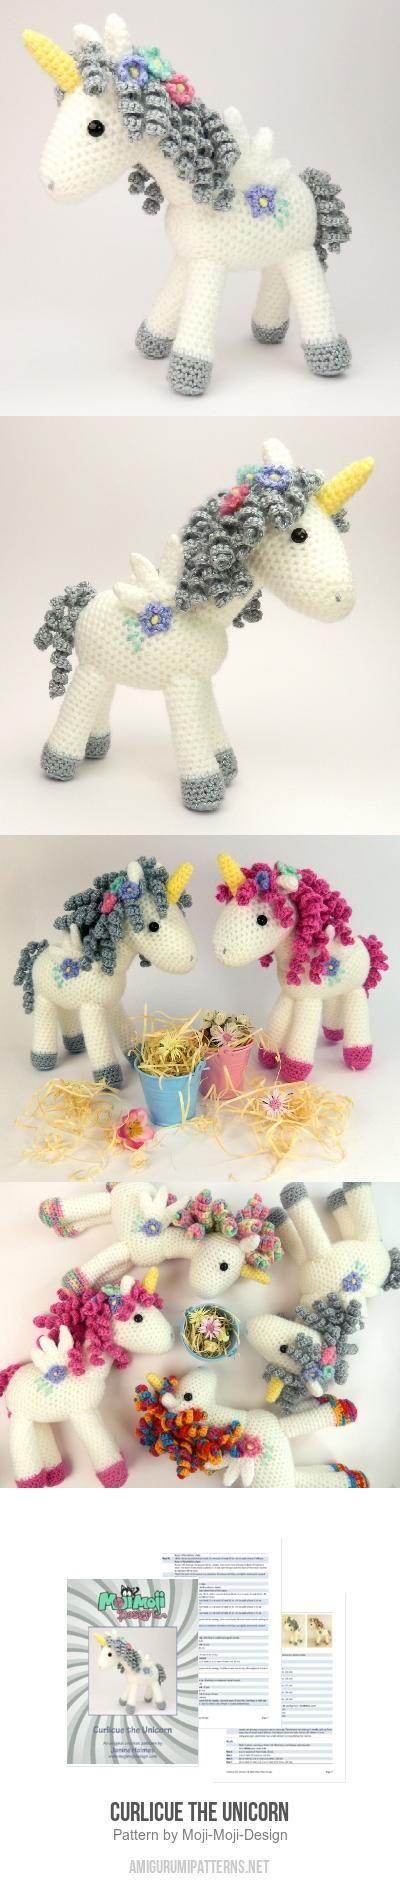 Crochet Unicorn Hair : ... unicorn shops hair unicorns amigurumi amigurumi patterns the o jays